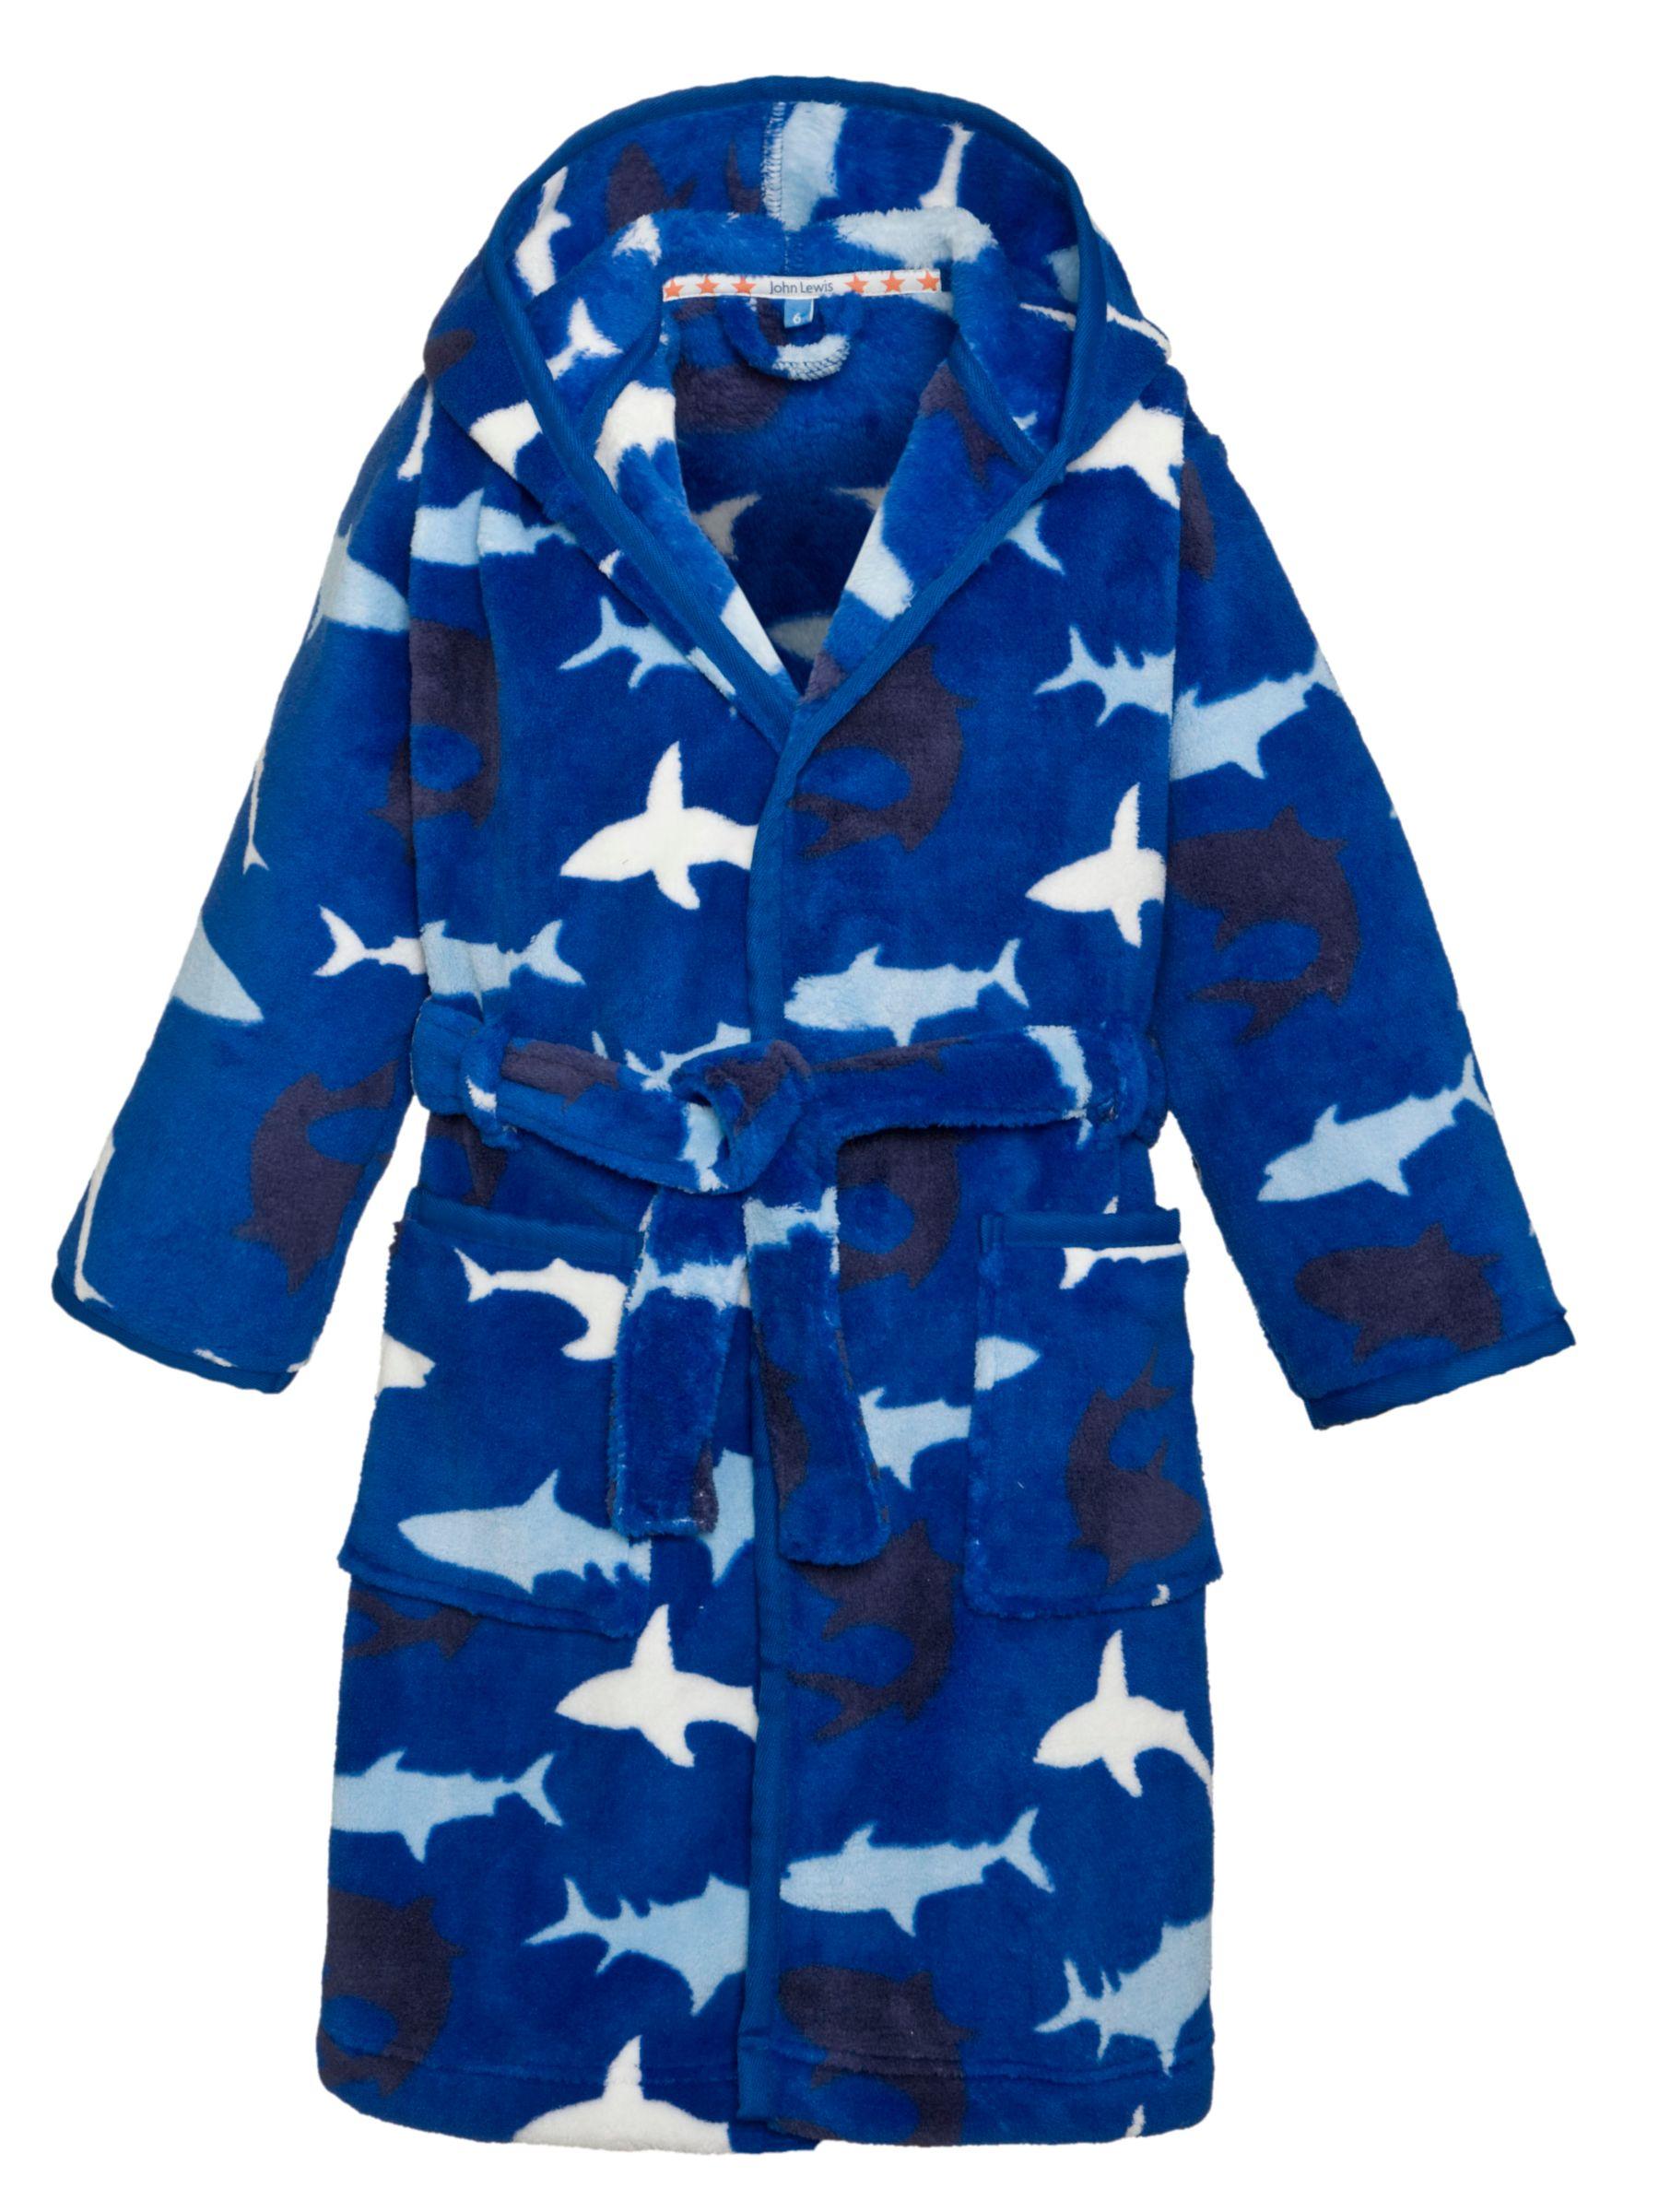 John Lewis Boy Shark Print Hooded Robe, Blue